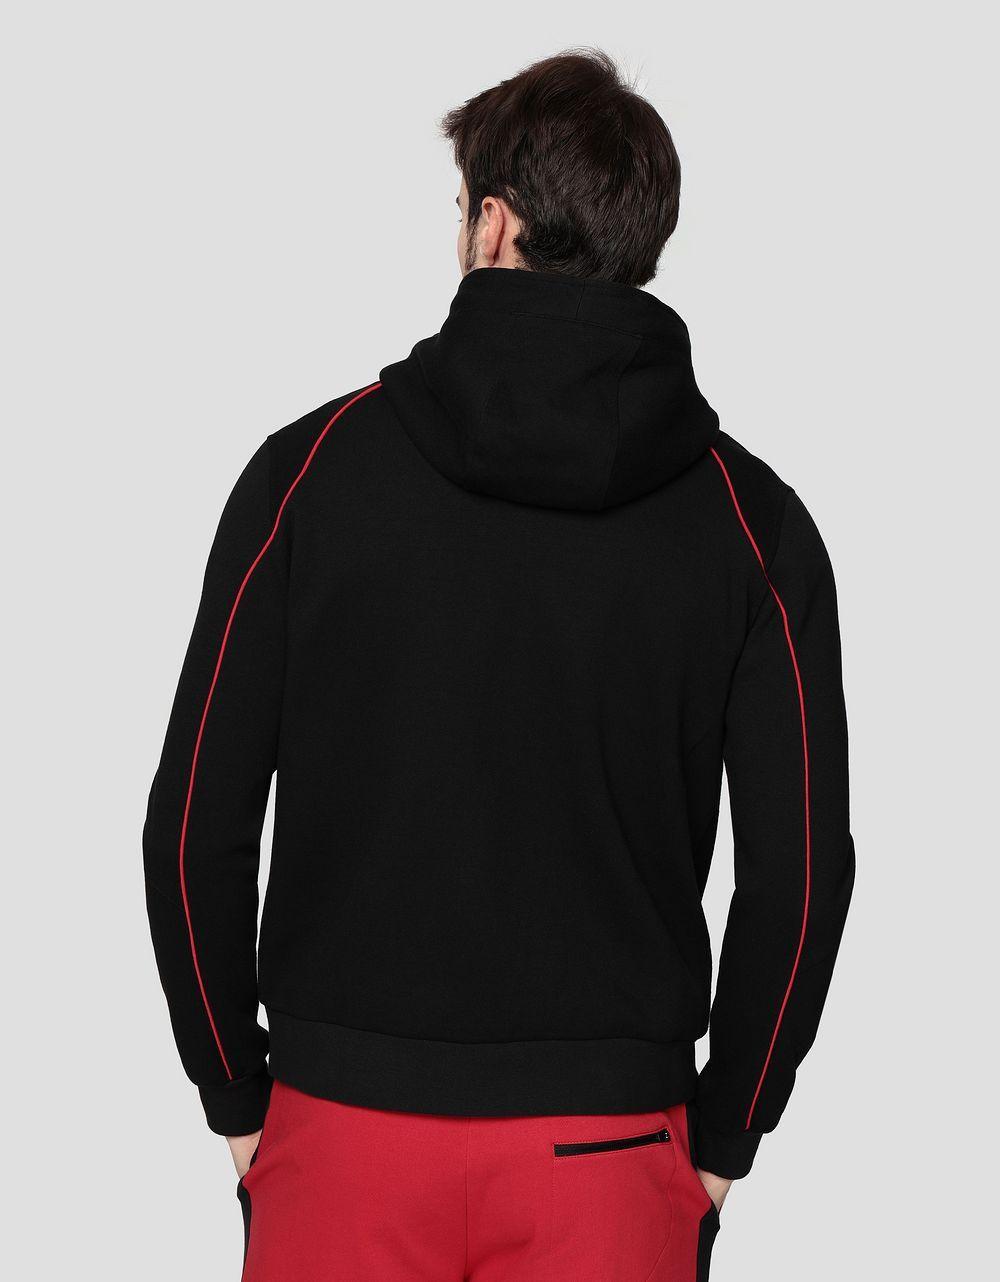 Ferrari Men S Hooded Sweatshirt With Fit System Man Scuderia Ferrari Official Store Hooded Sweatshirt Men Hooded Sweatshirts Sweatshirts [ 1282 x 1000 Pixel ]